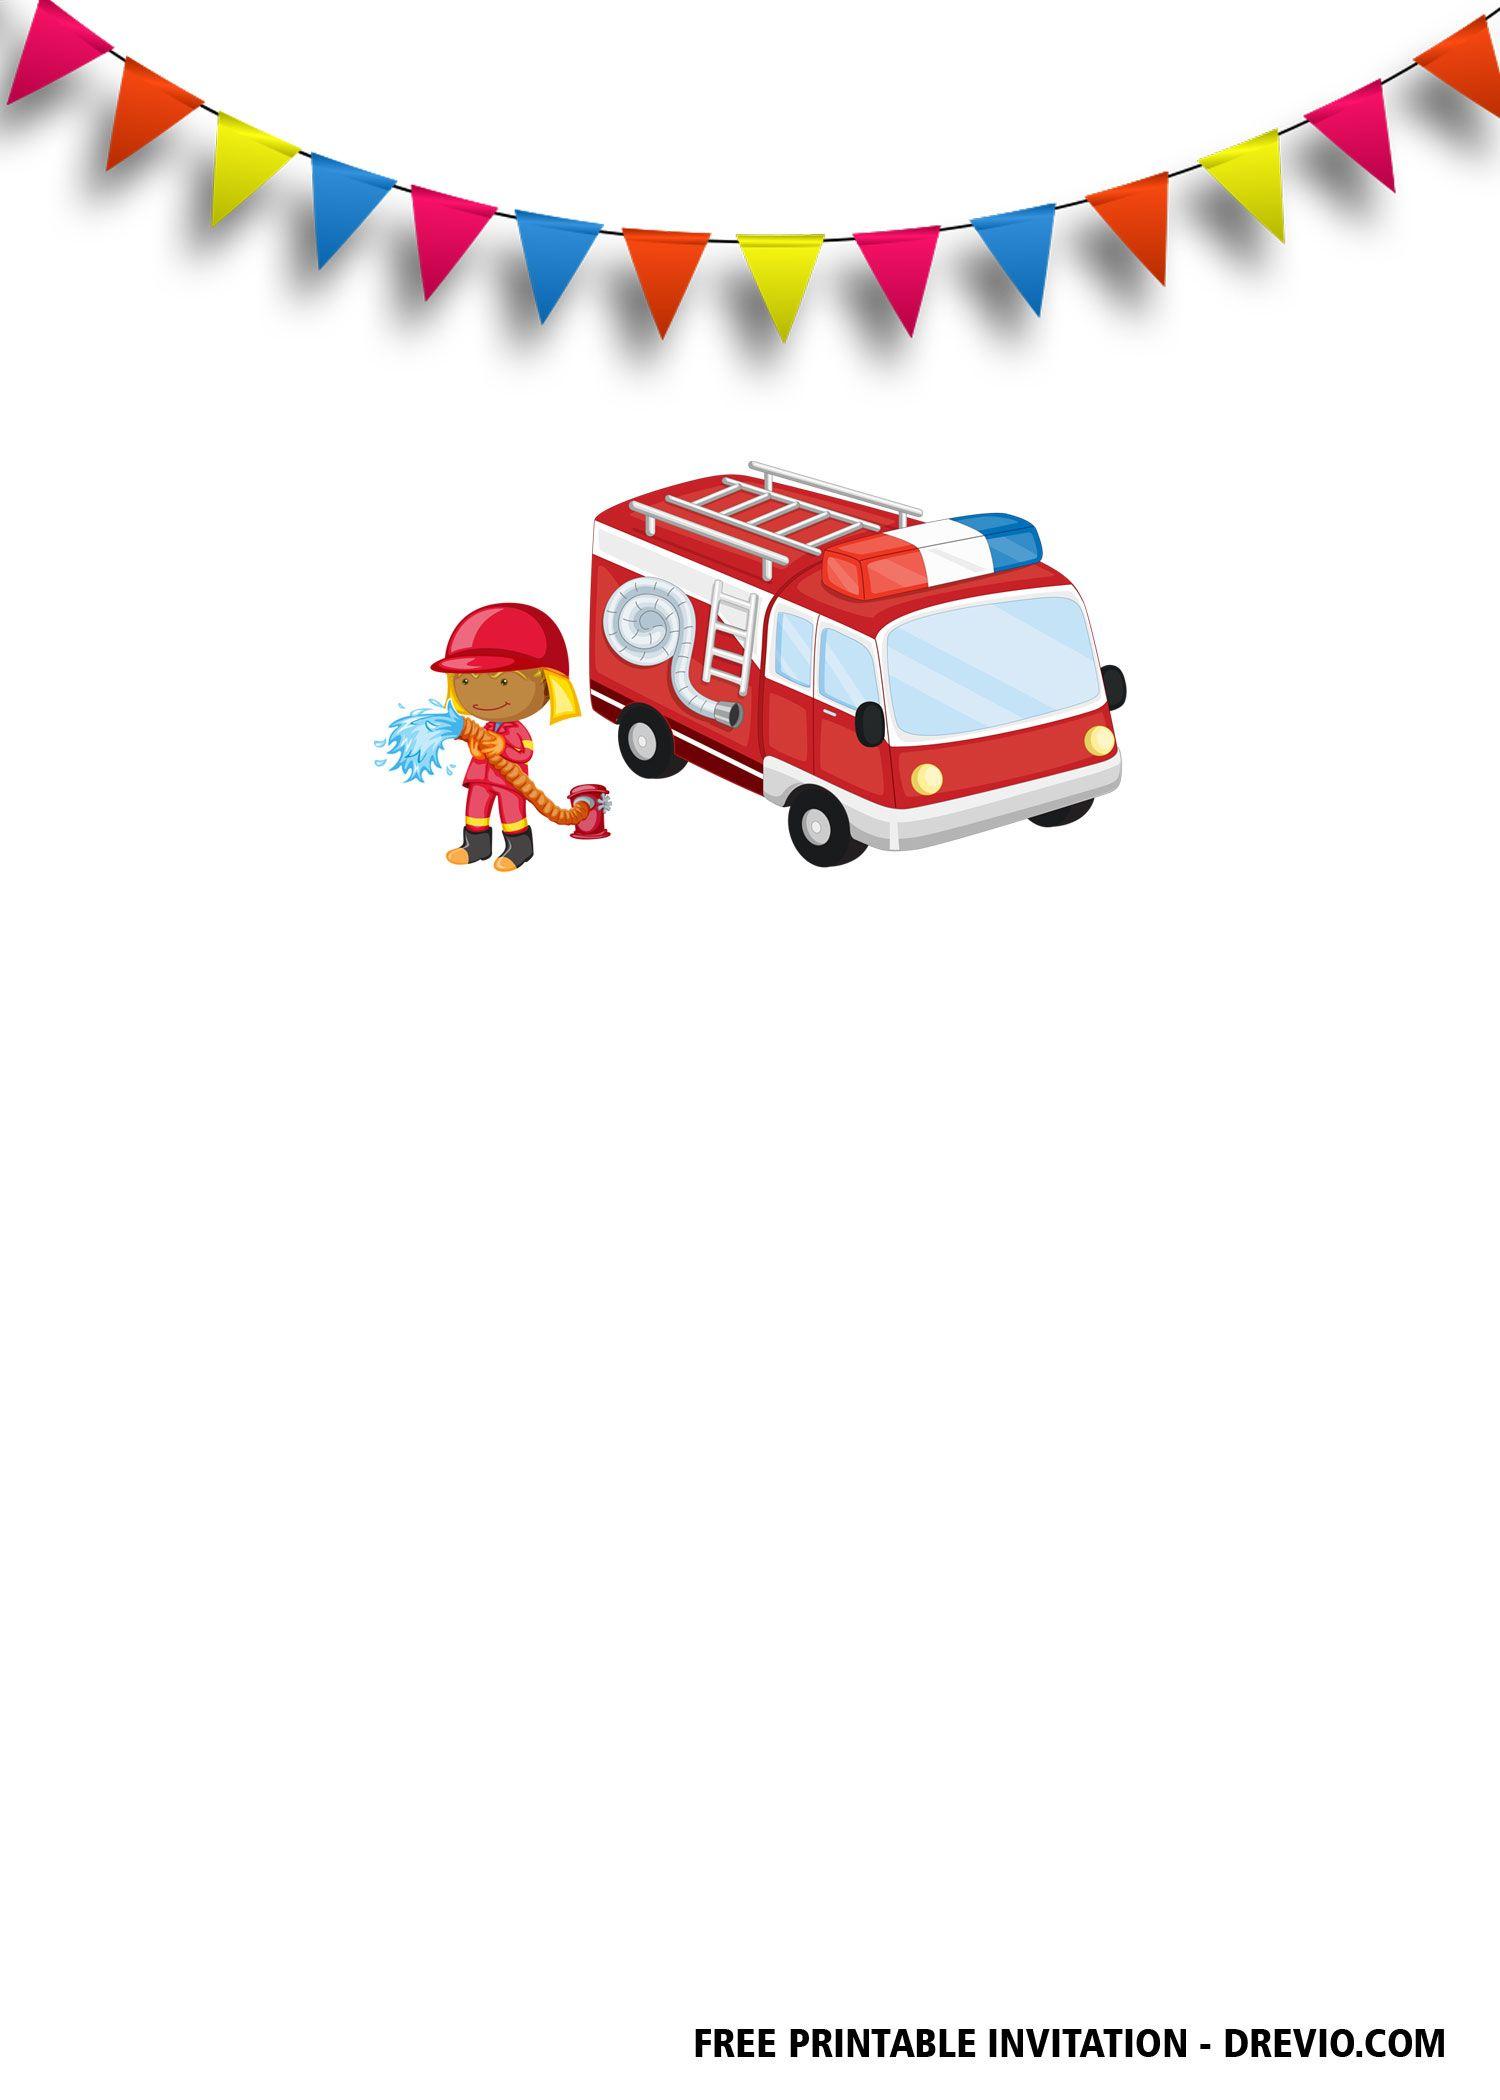 Free Fireman Birthday Invitation Templates Fireman Birthday Printable Birthday Invitations Free Printable Birthday Invitations